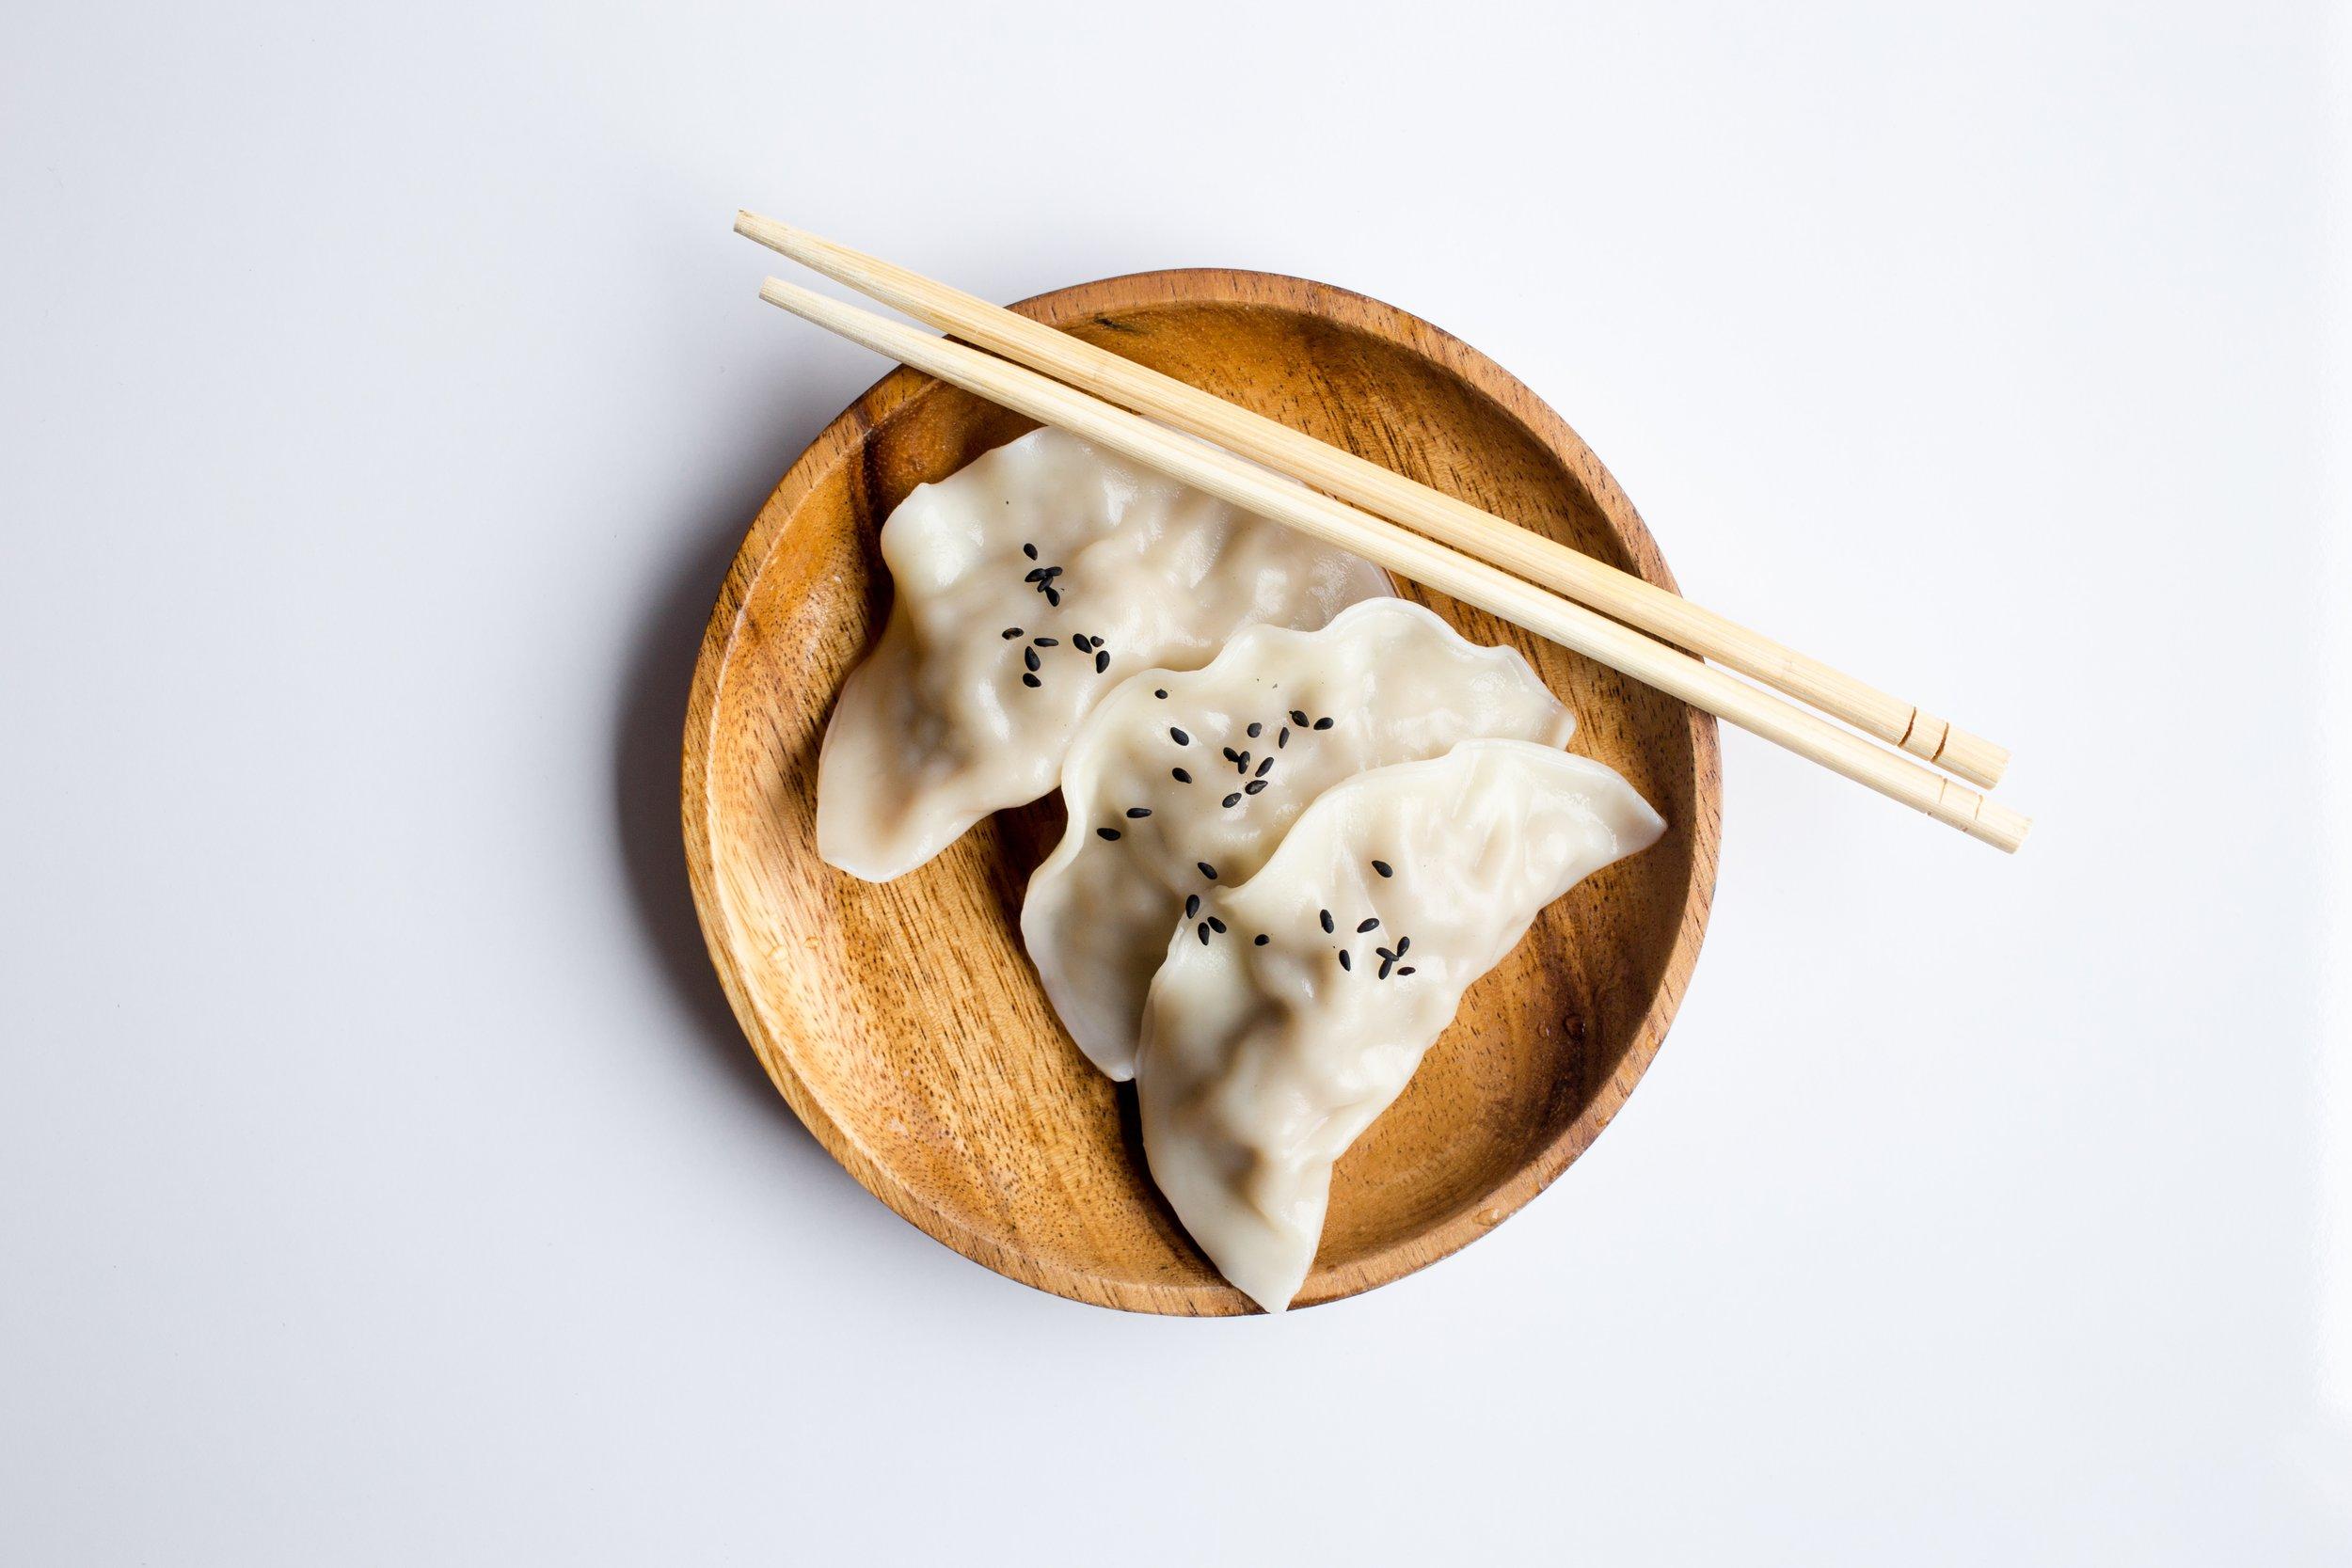 Pork Dumplings with cannabis infused sesame oil - via Monica Lo | @sousweed